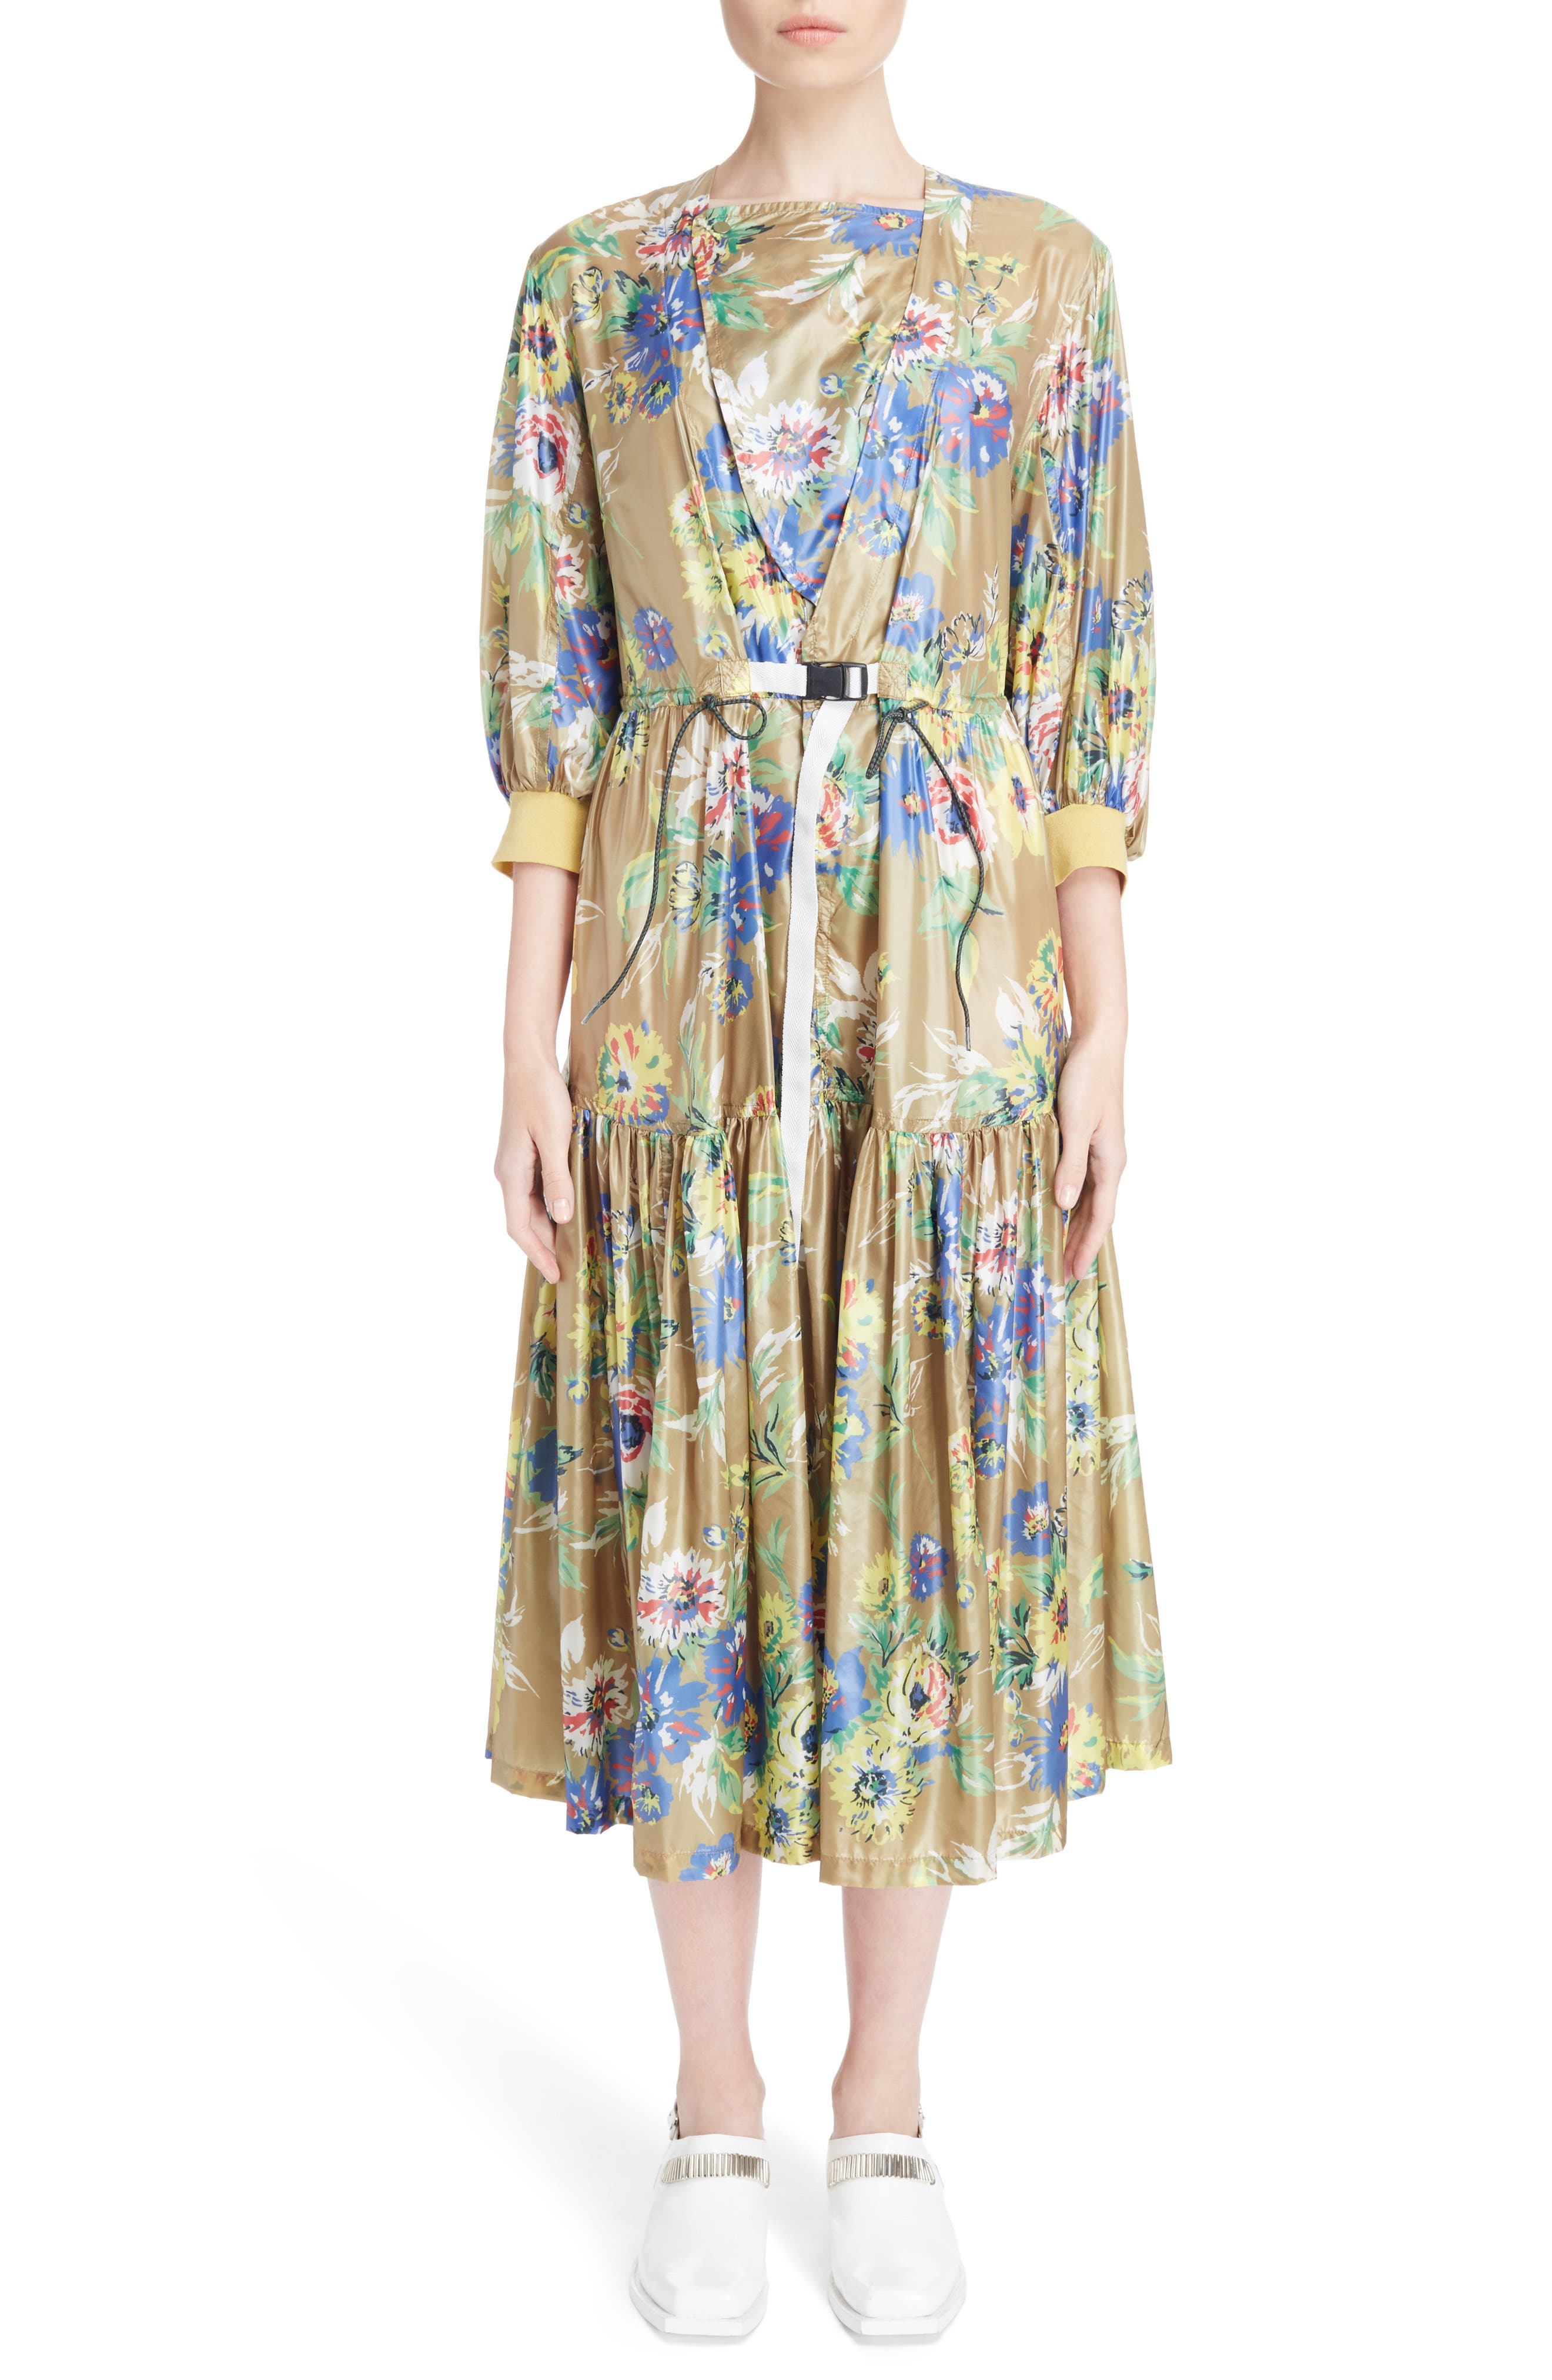 TOGA Floral Print Dress